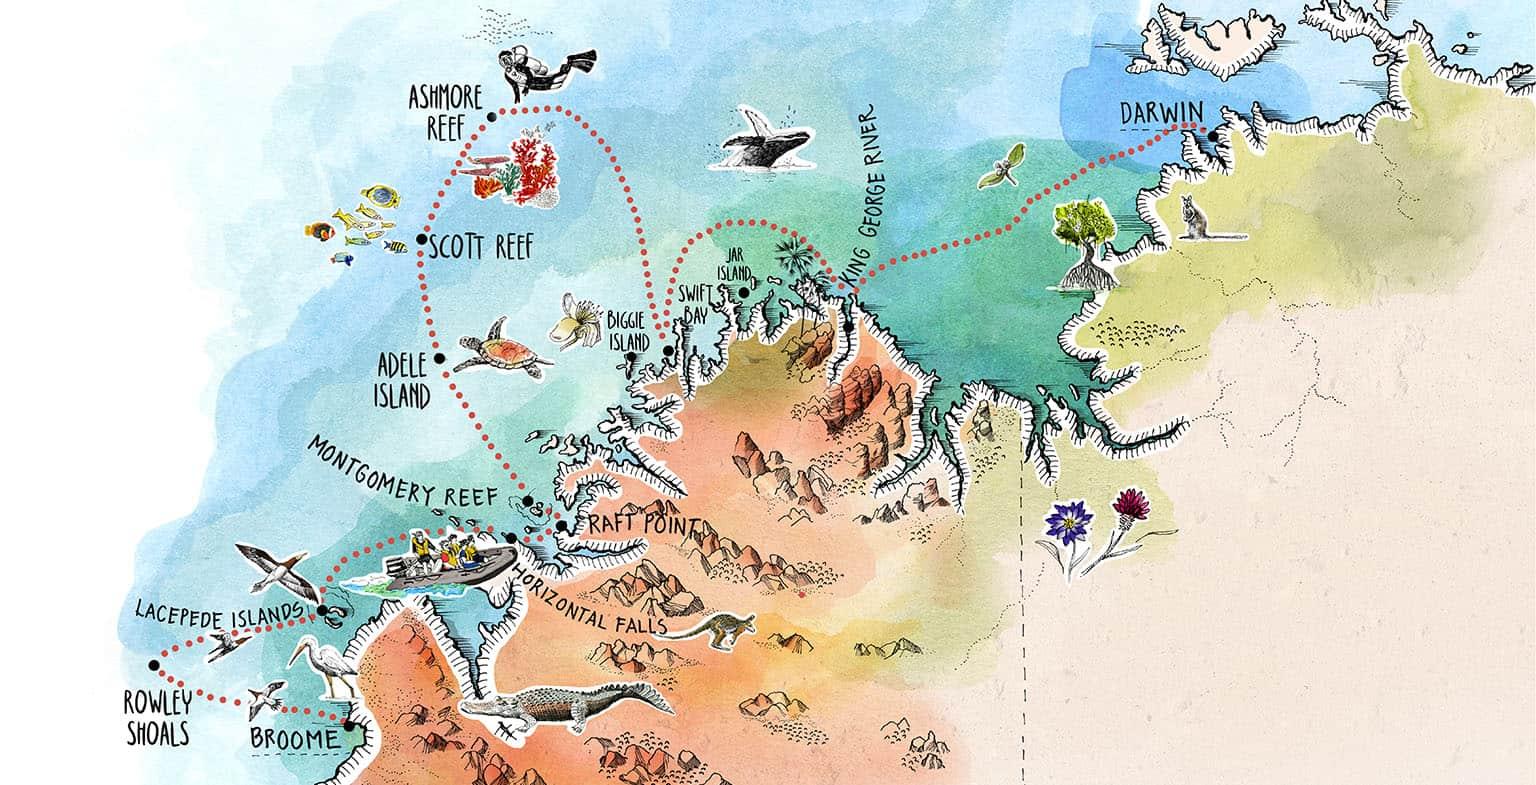 Kimberley-Ashmore-Rowley-Shoals-Voyage-Western-Australia-1